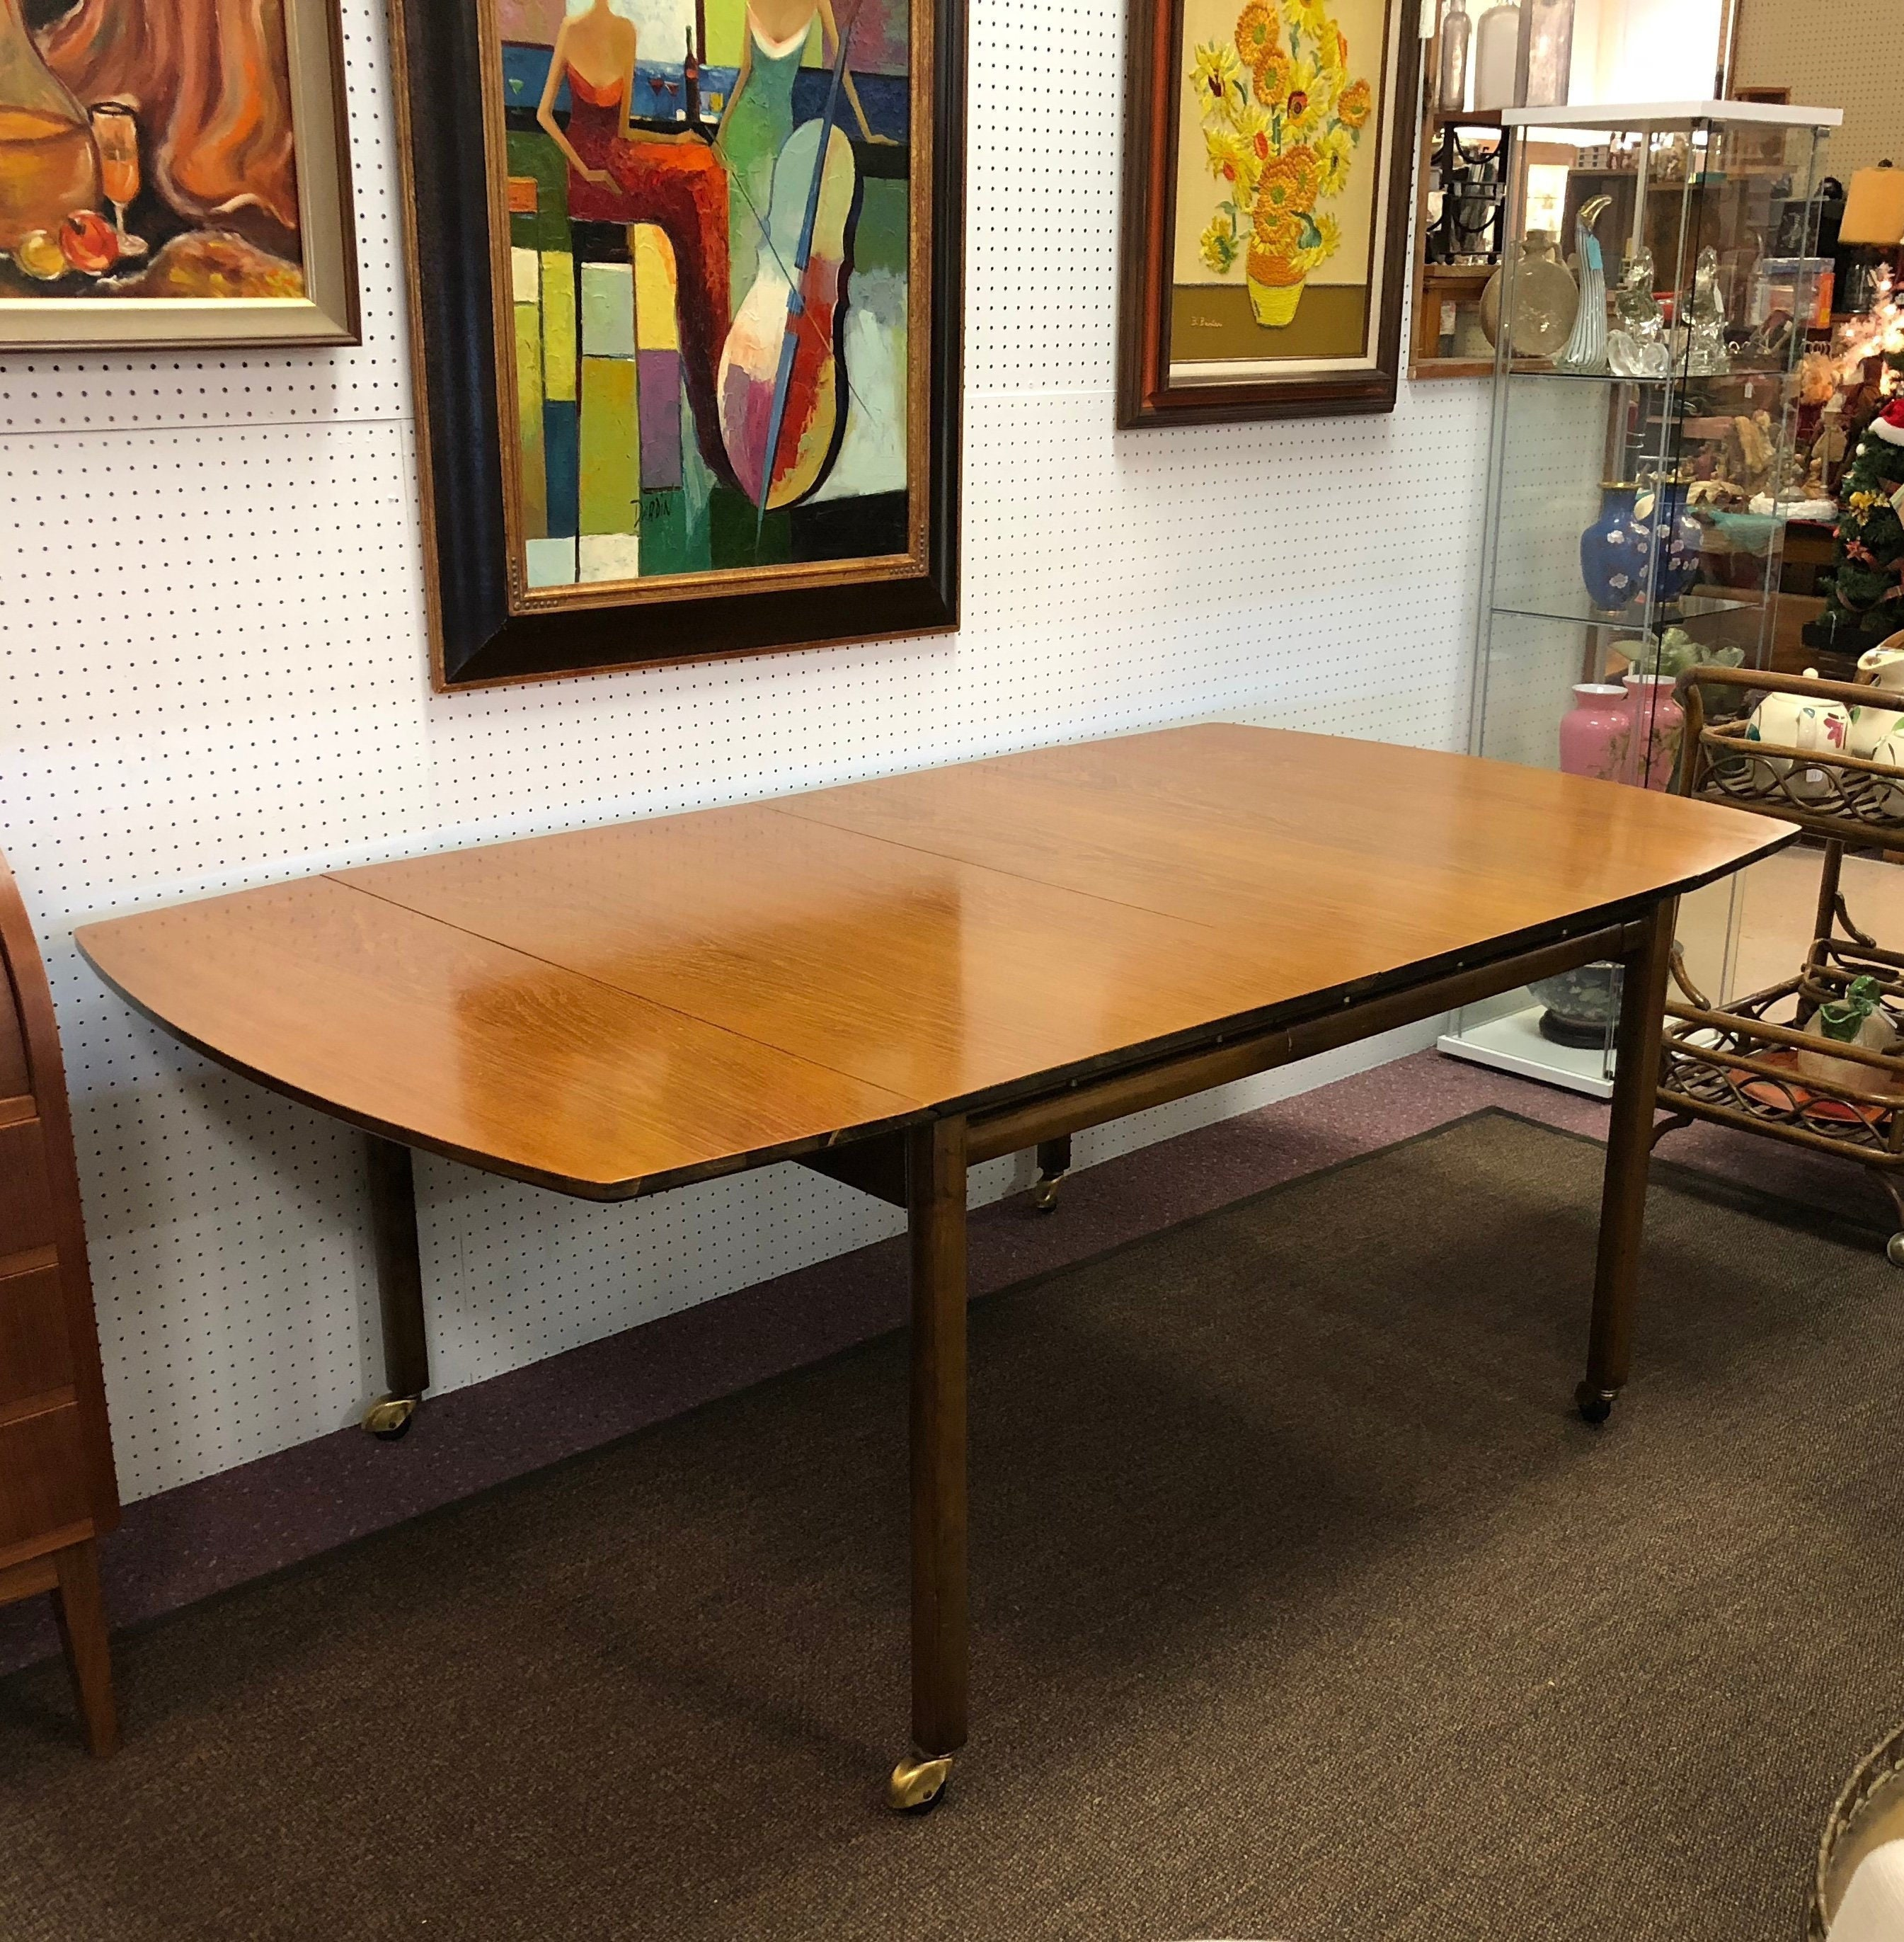 Mid century modern baker furniture expandable drop leaf dining table with leaf c 1950s high end vintage